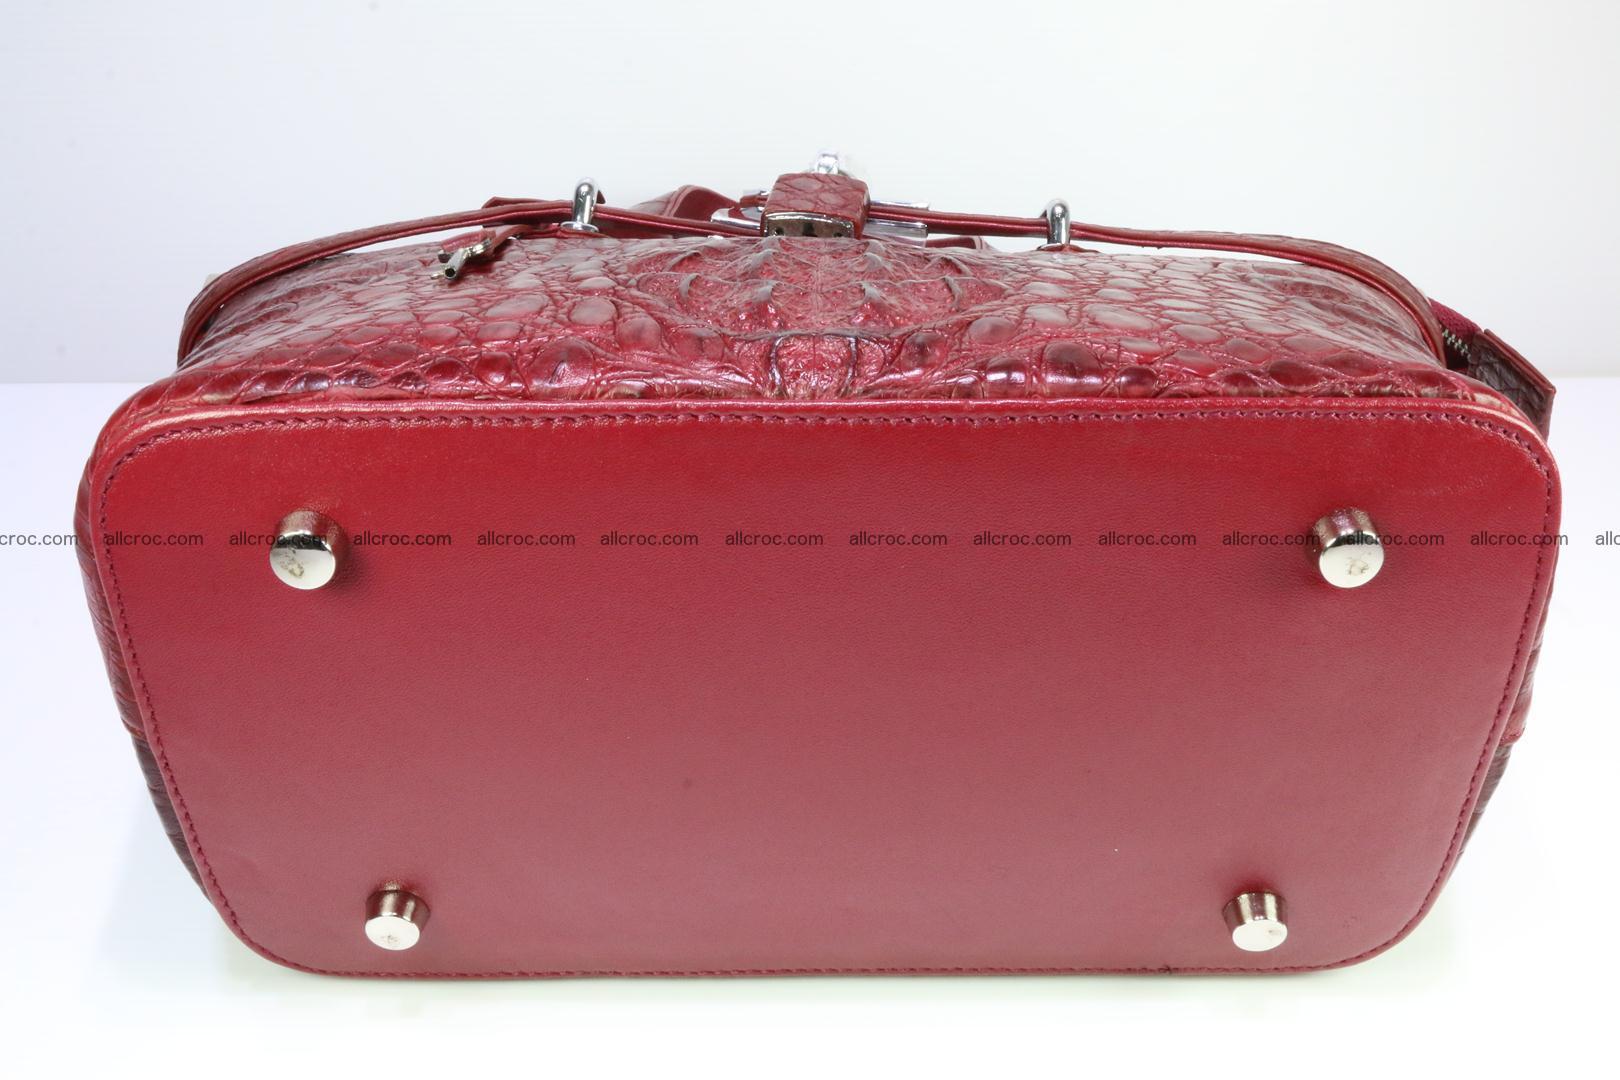 Genuine crocodile handbag for ladies 046 Foto 9